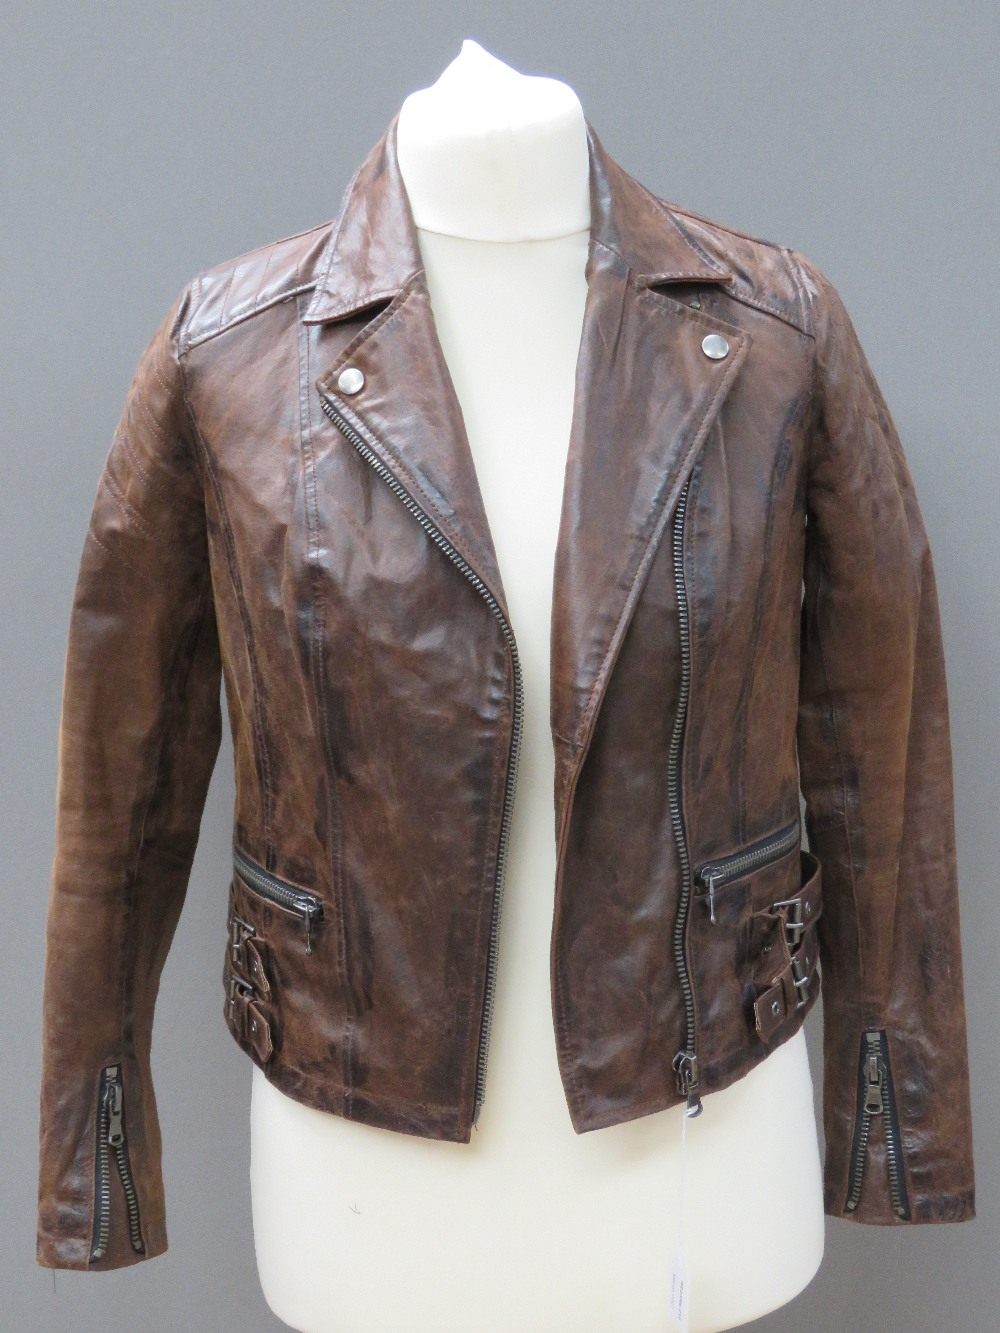 A brown leather biker style jacket by Ne